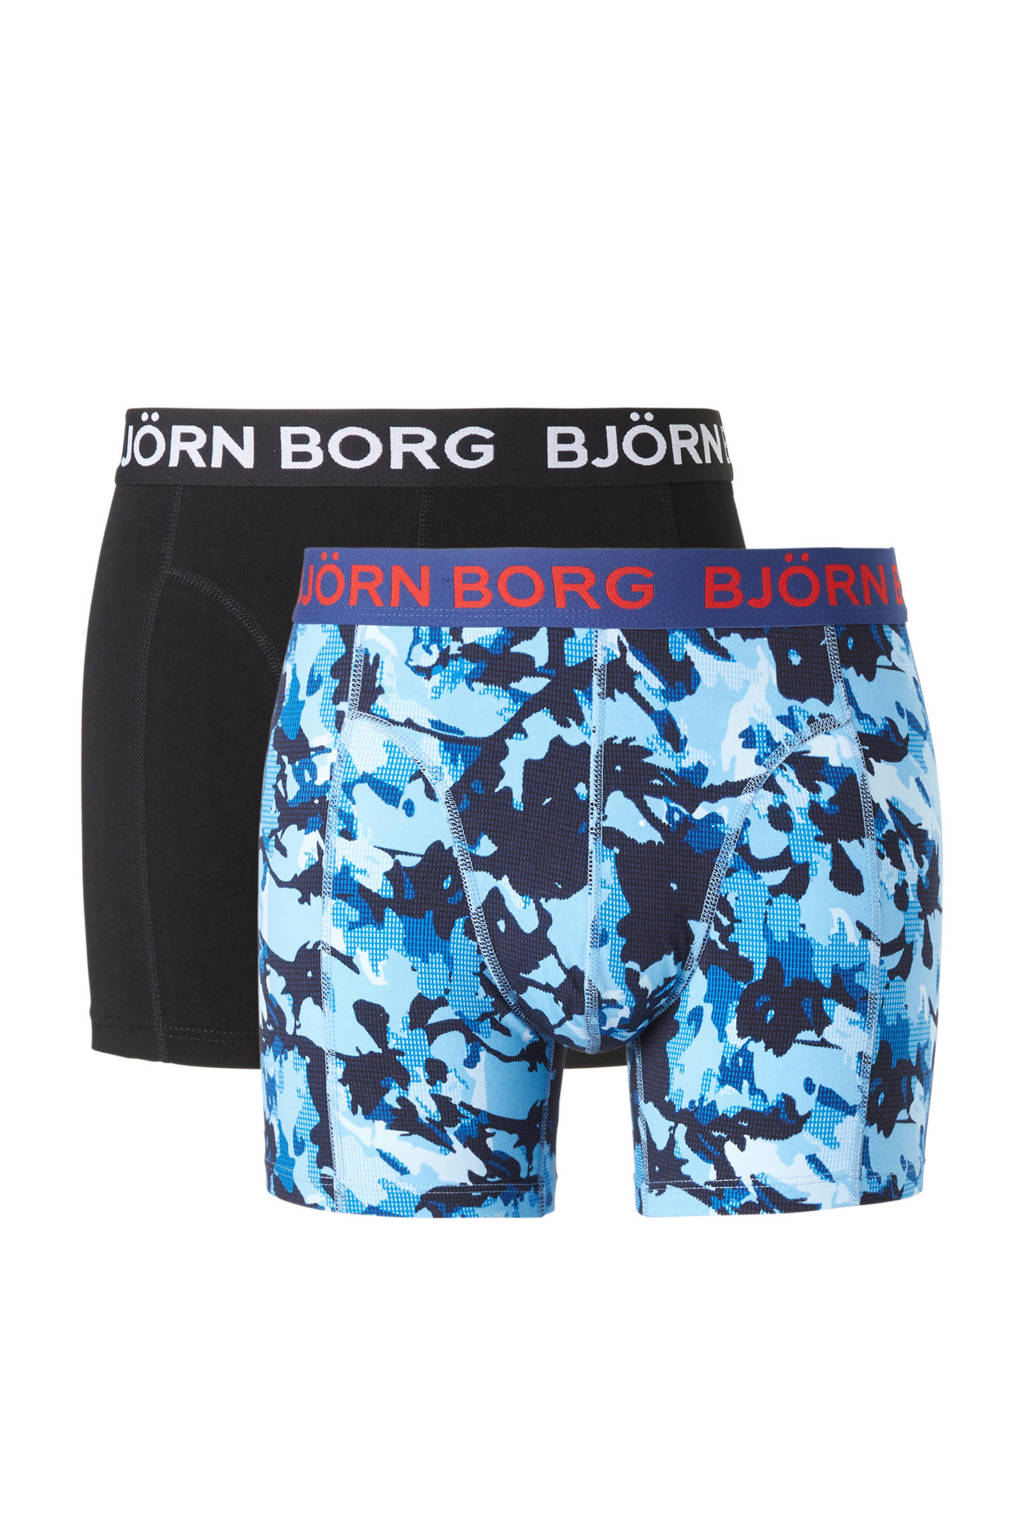 Björn Borg boxershort (set van 2), Donkerblauw/zwart